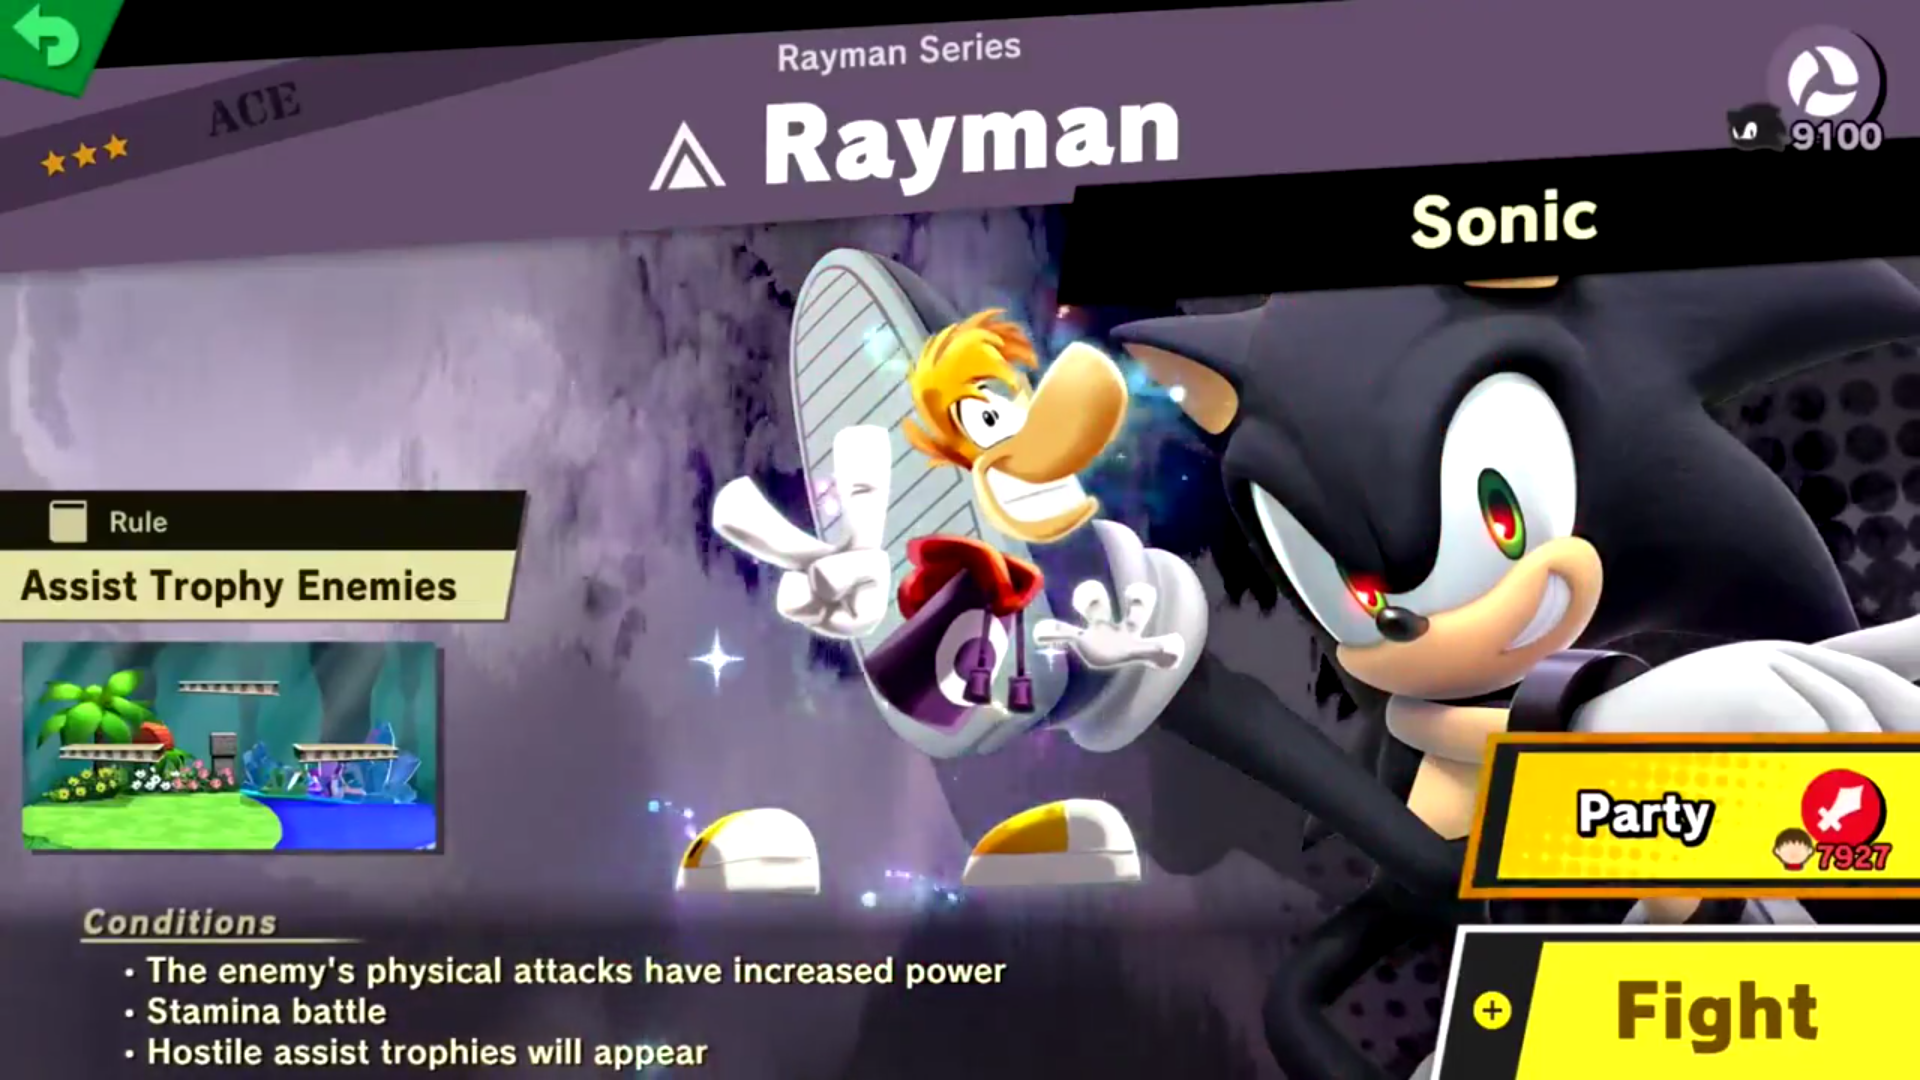 Rayman S Spirit Battle In World Of Light Super Smash Brothers